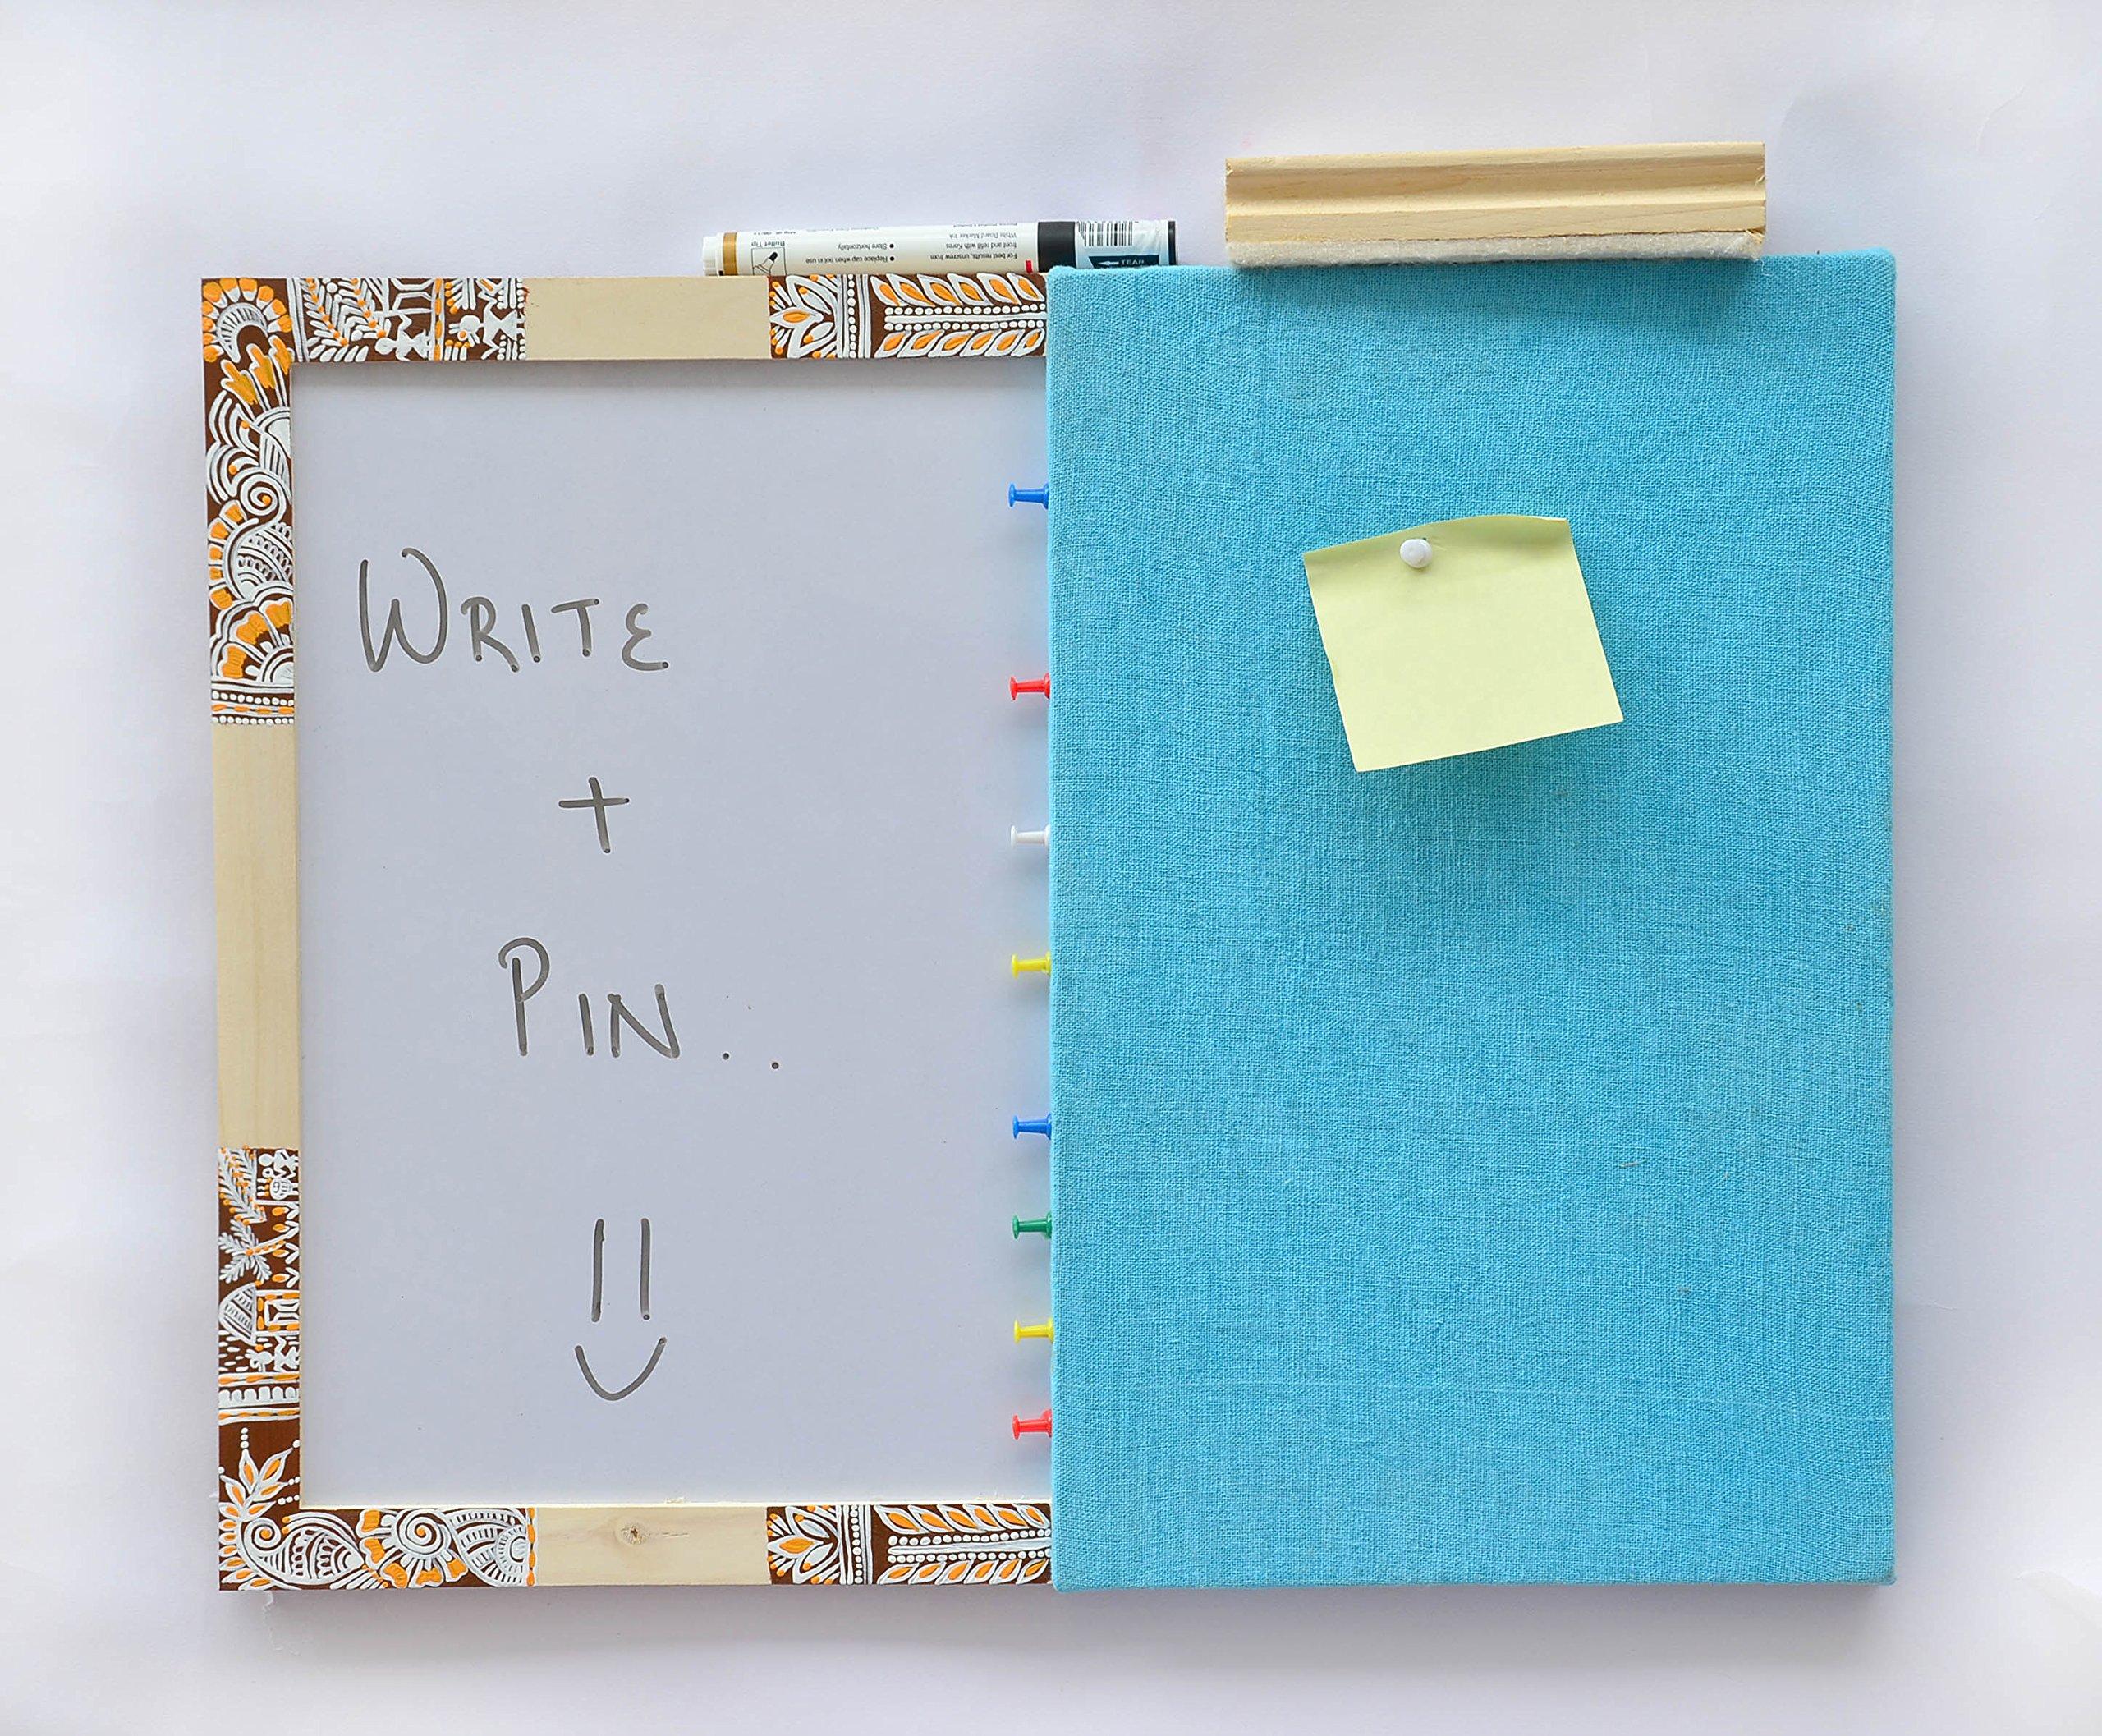 IVEI Pinboard + Whiteboard, Combination Board - Handpainted Chowk Work